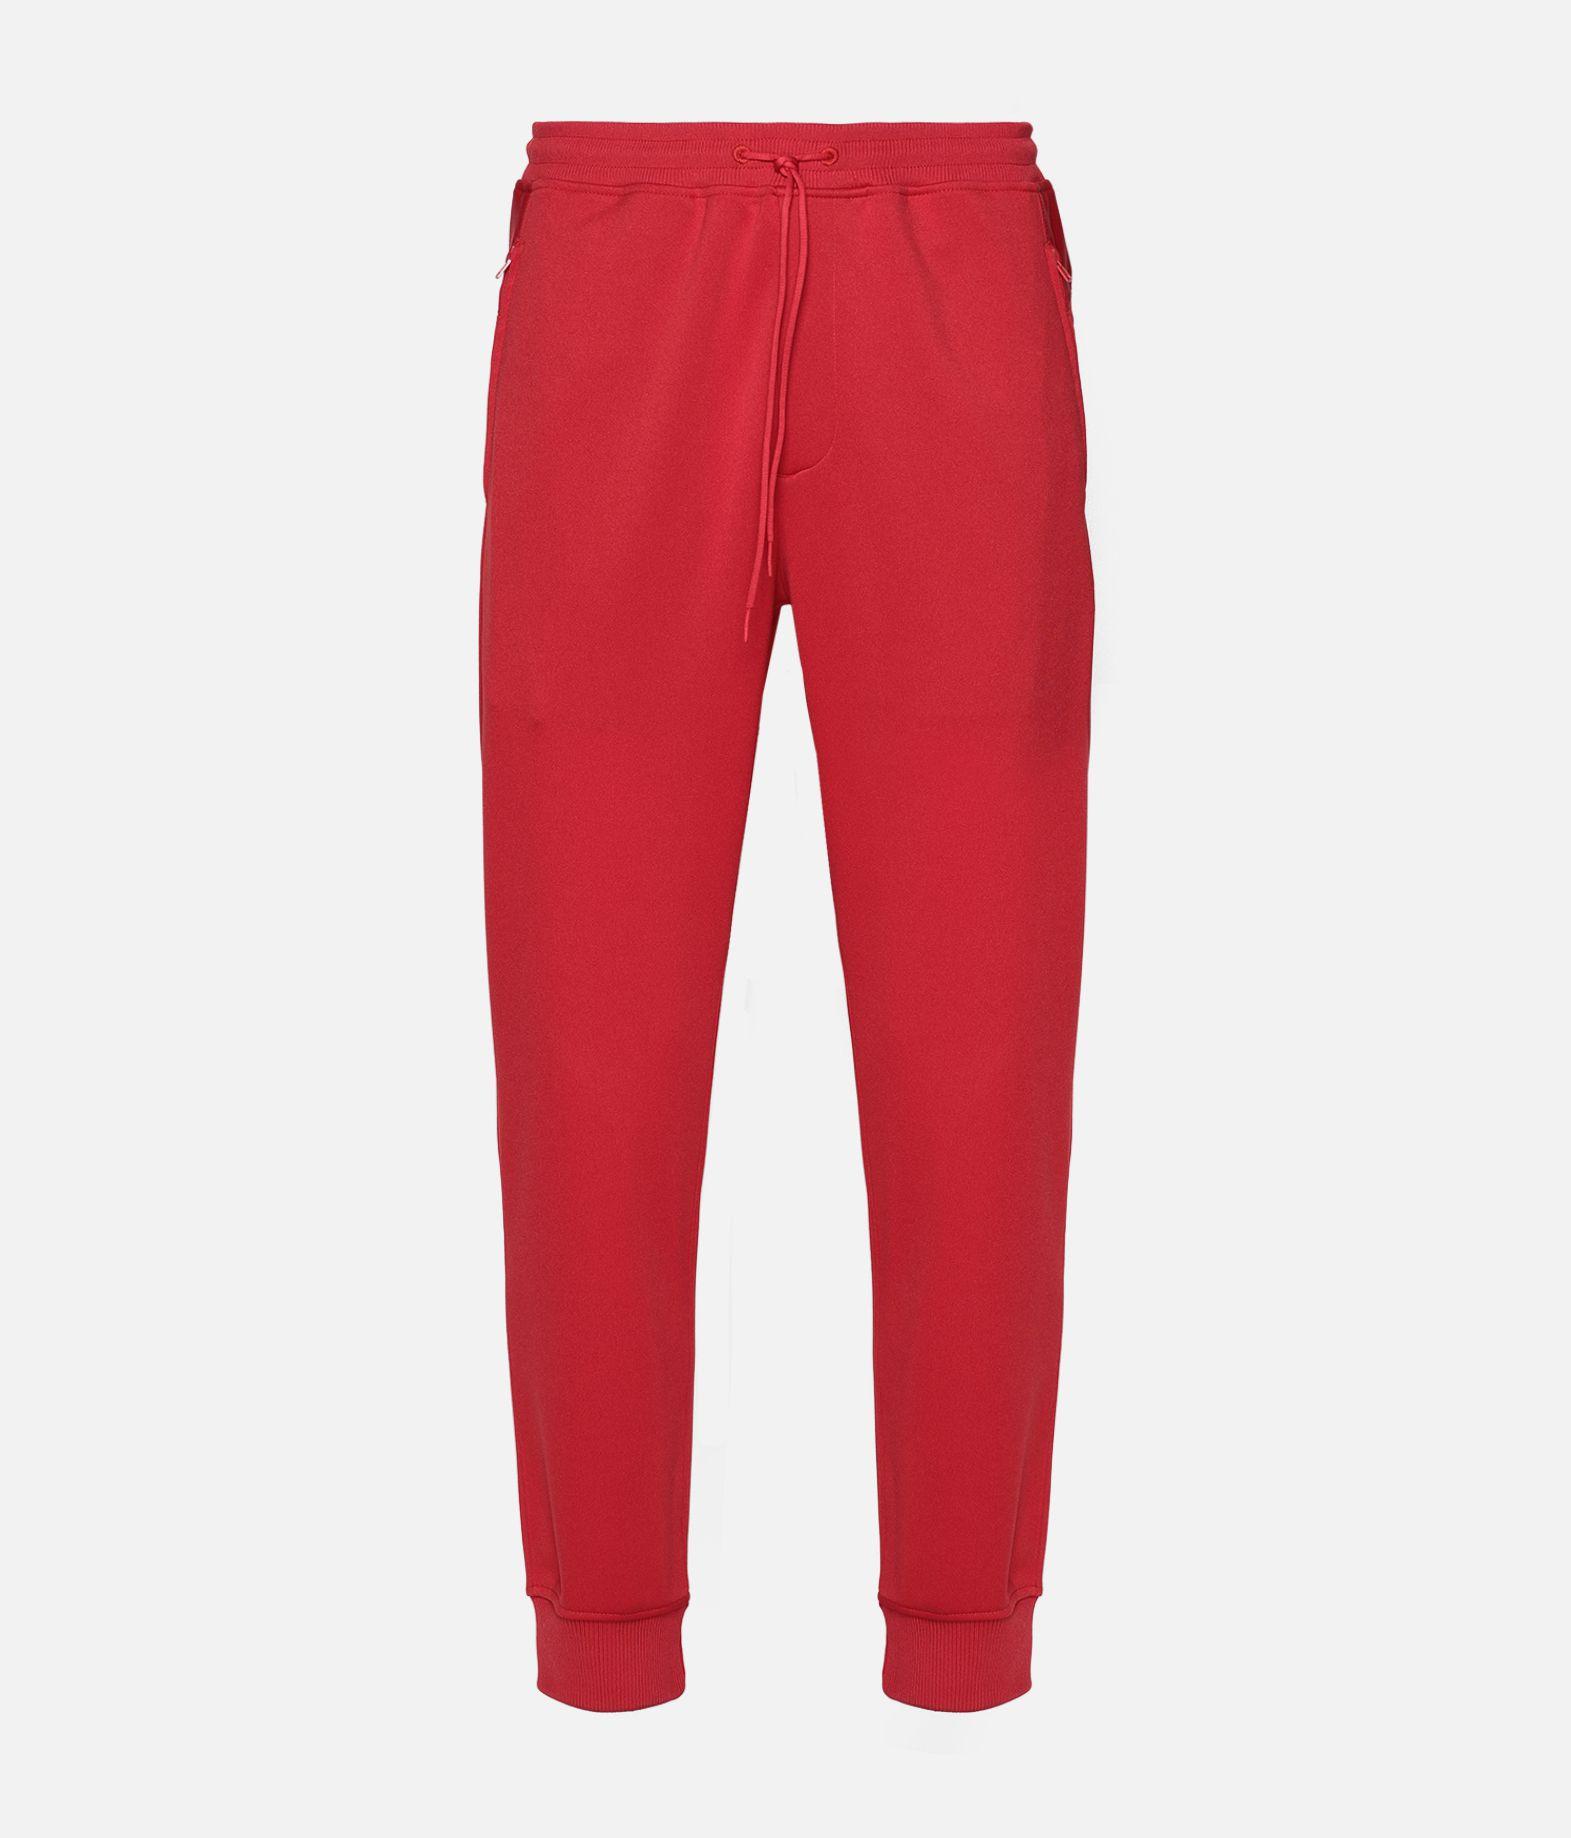 Y-3 Y-3 Classic Track Pants Тренировочные брюки Для Мужчин f